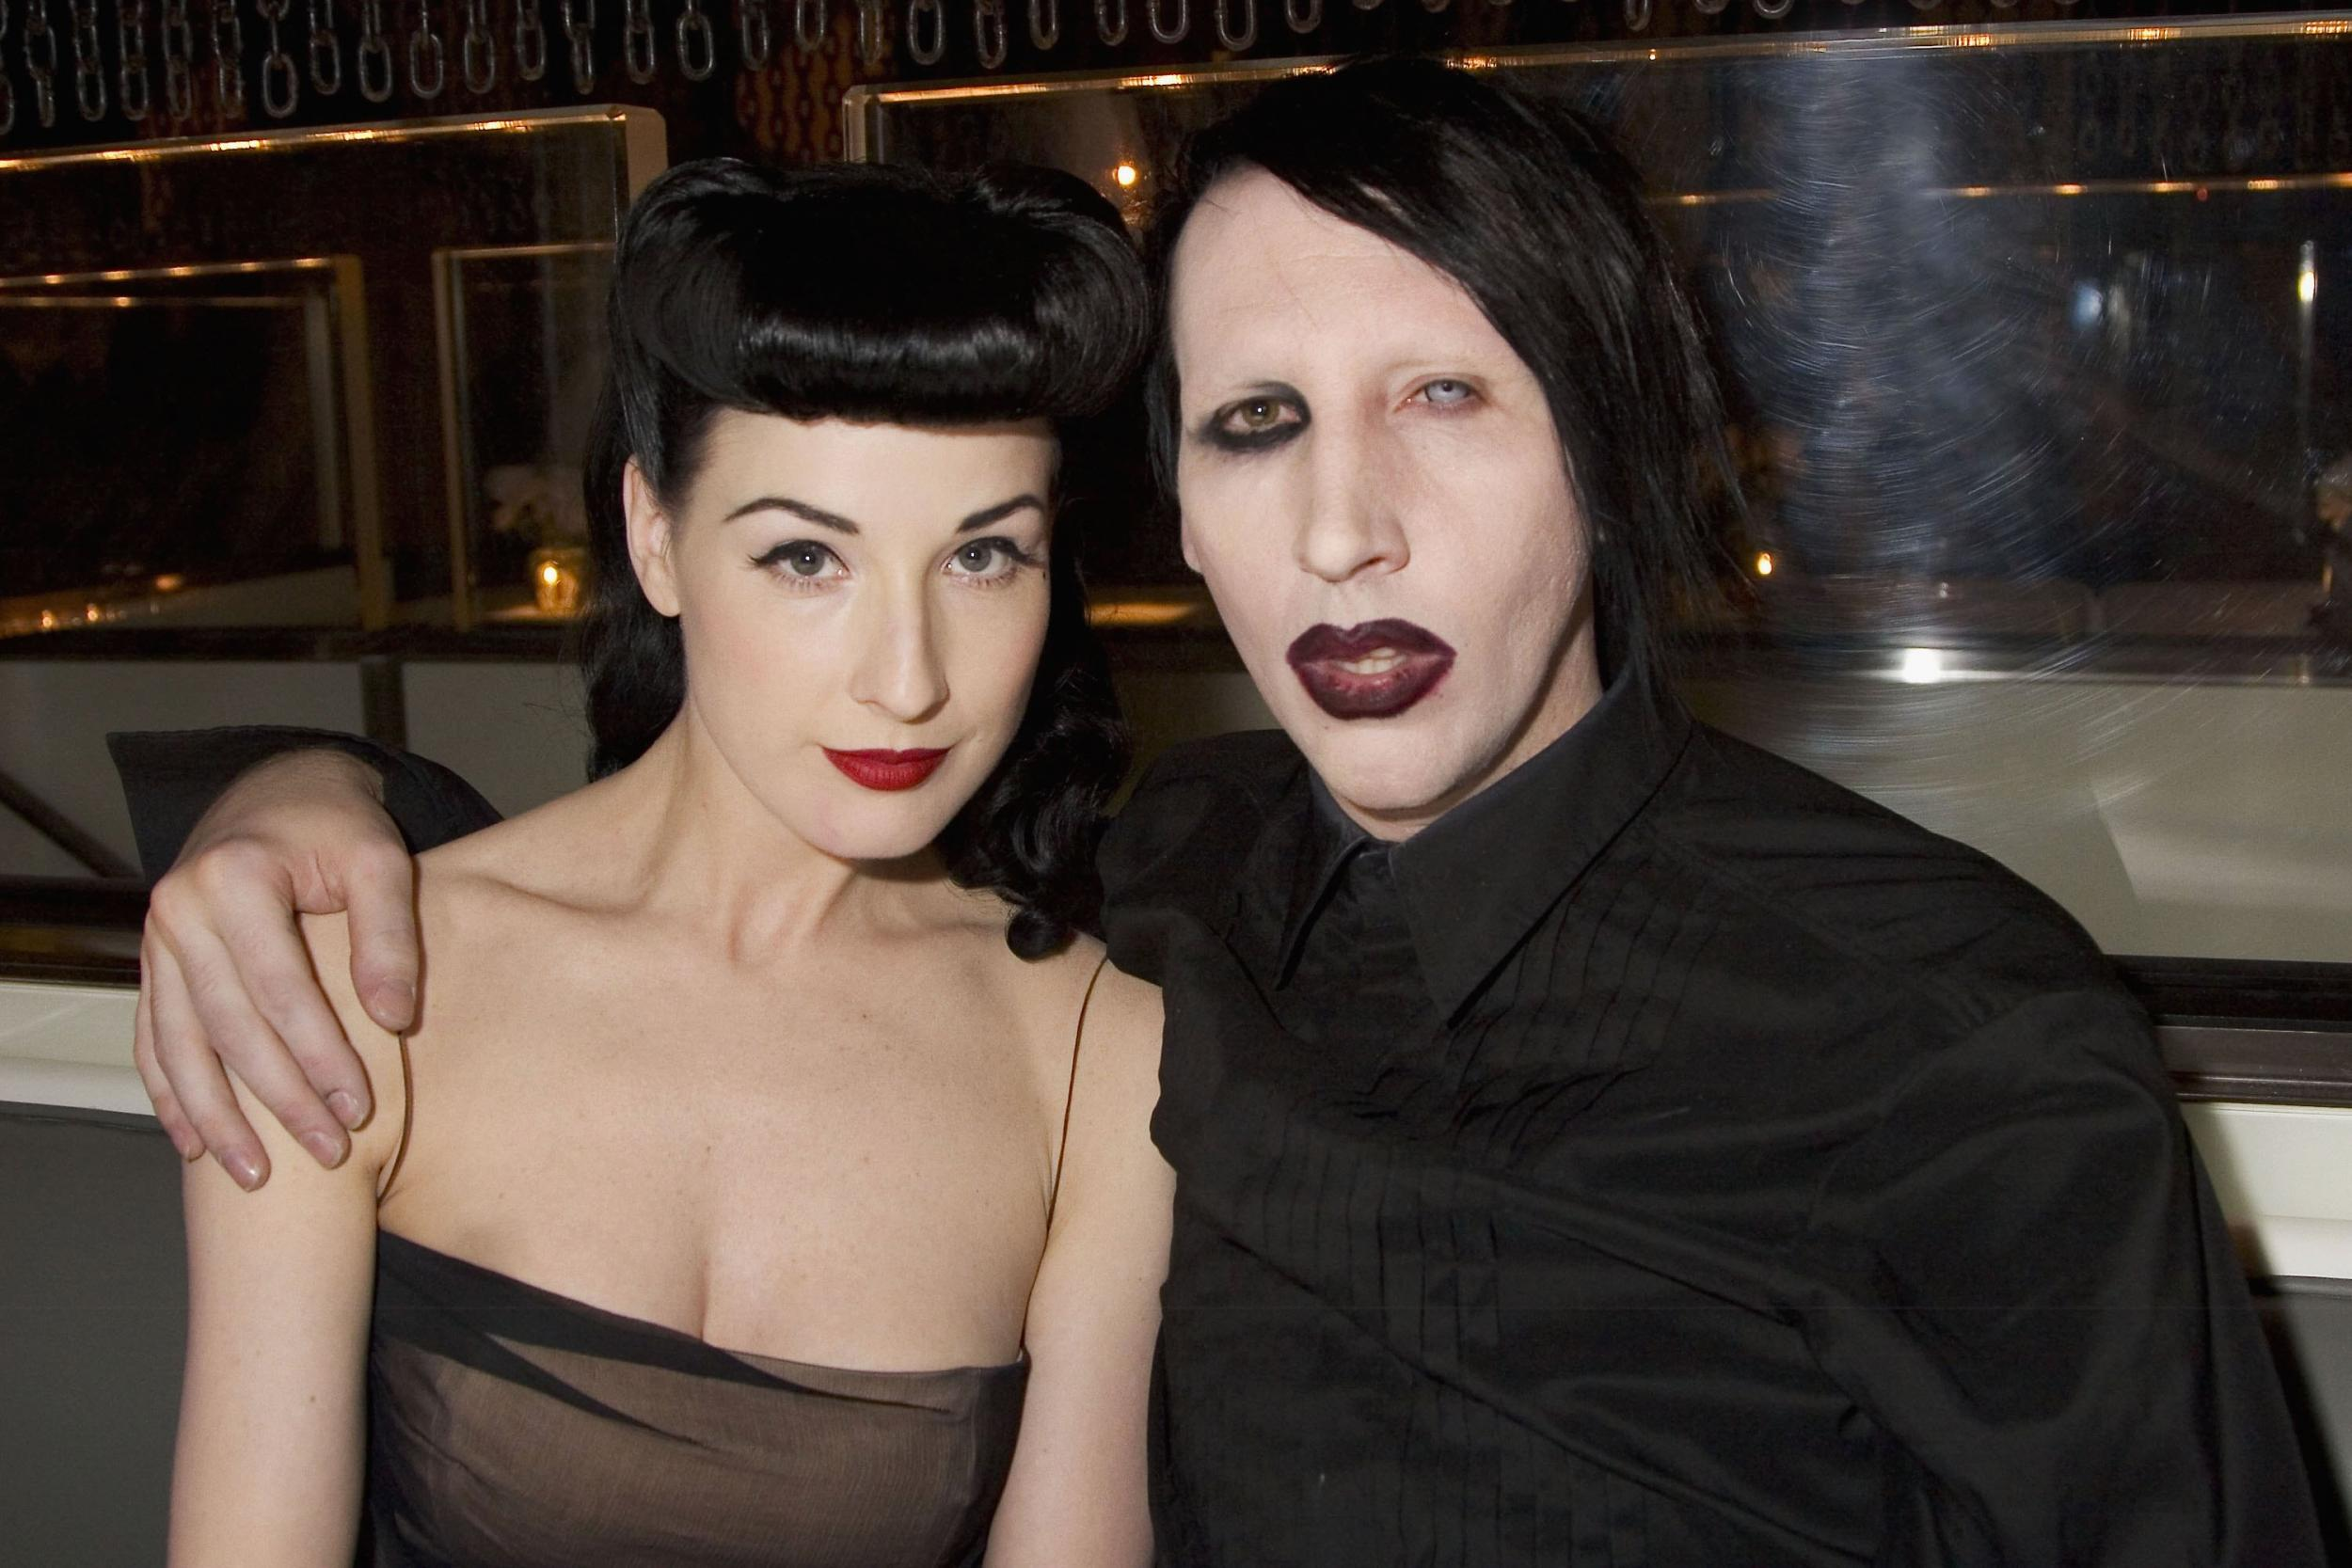 Dita Von Teese on remaining friends with Marilyn Manson ... Evan Rachel Wood Weight